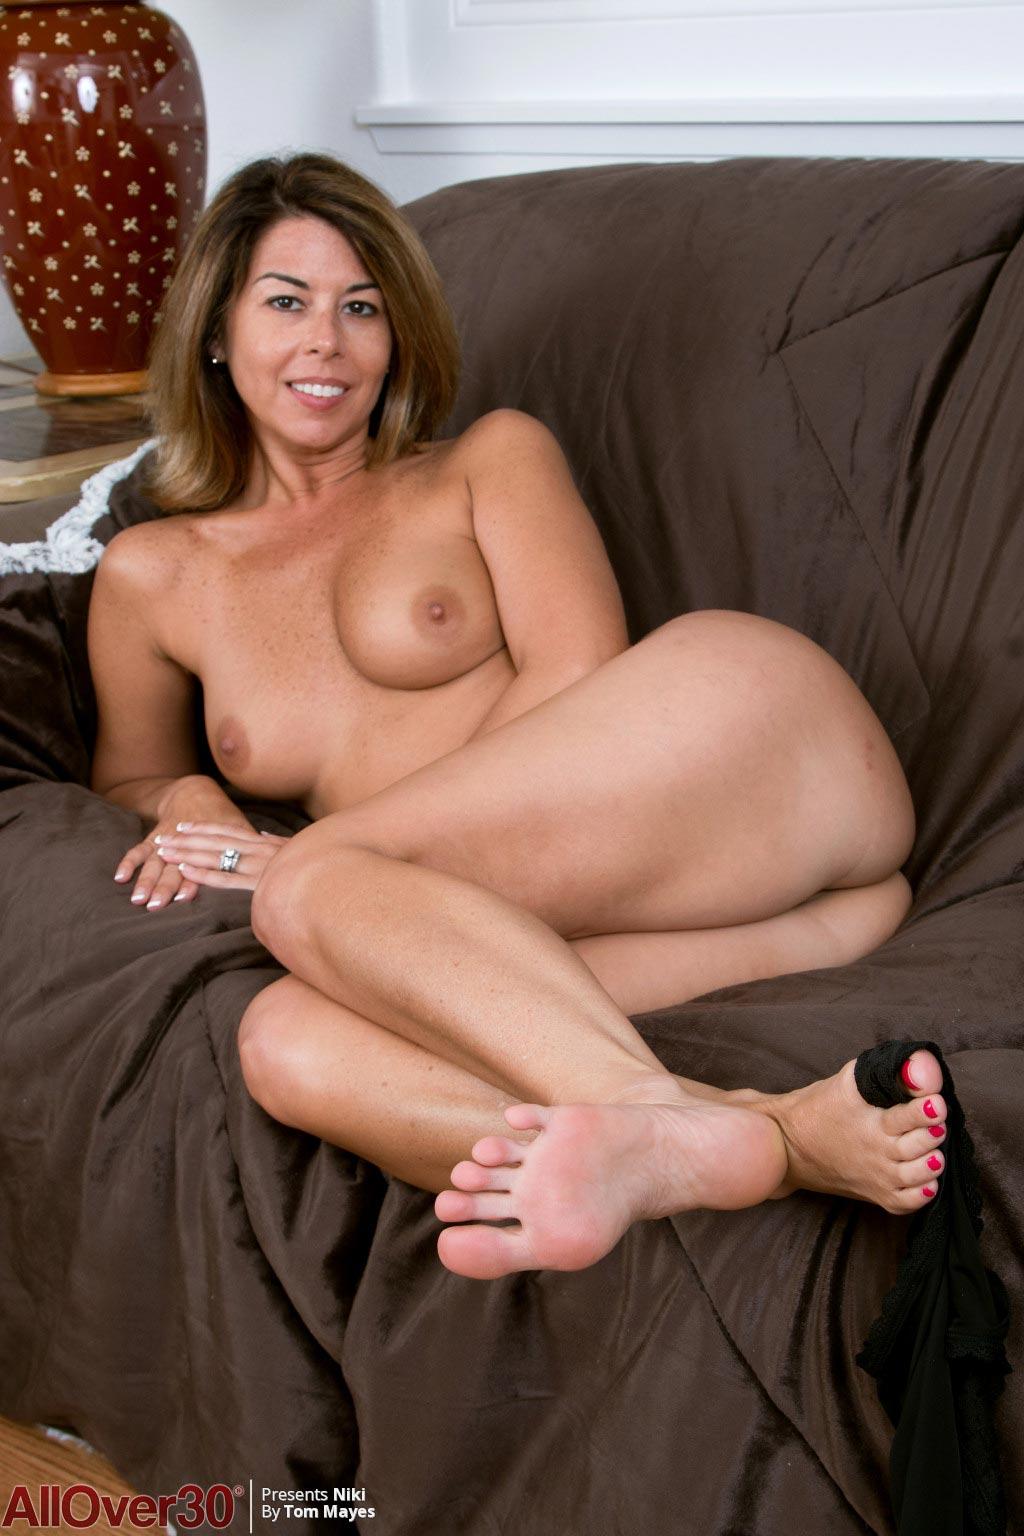 Yummy Niki Hot Milf With Sexy Feet-7432